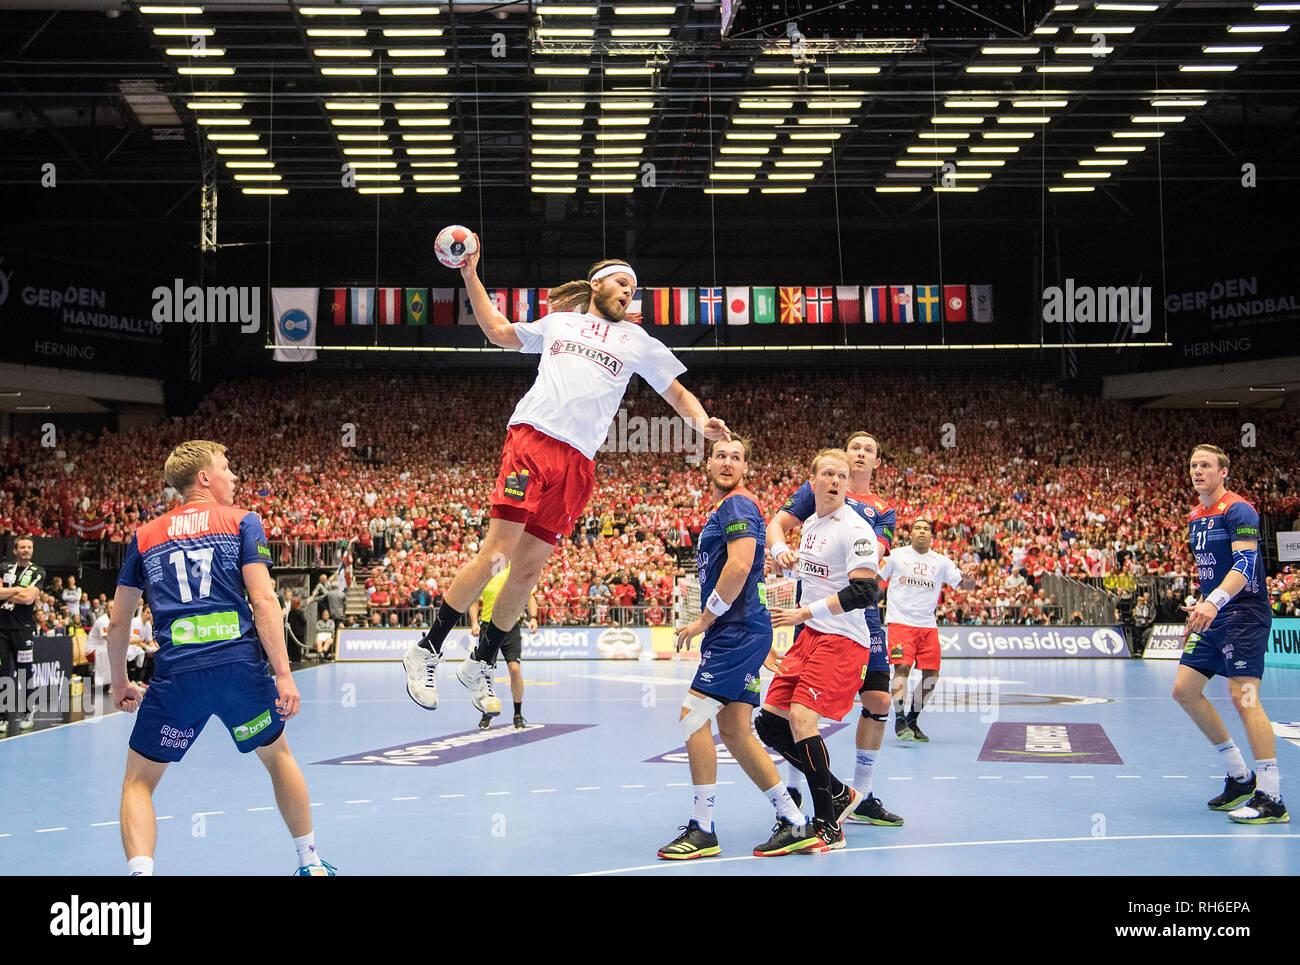 Jump shot by Mikkel HANSEN (DEN) action, Magnus JONDAL l. (NOR) is watching, Litter, Final, Norway (NOR) - Denmark (DEN) 22:31, 27.01.2019 in Herning/Denmark Handball World Cup 2019, from 10.01. - 27.01.2019 in Germany/Denmark.   usage worldwide Stock Photo